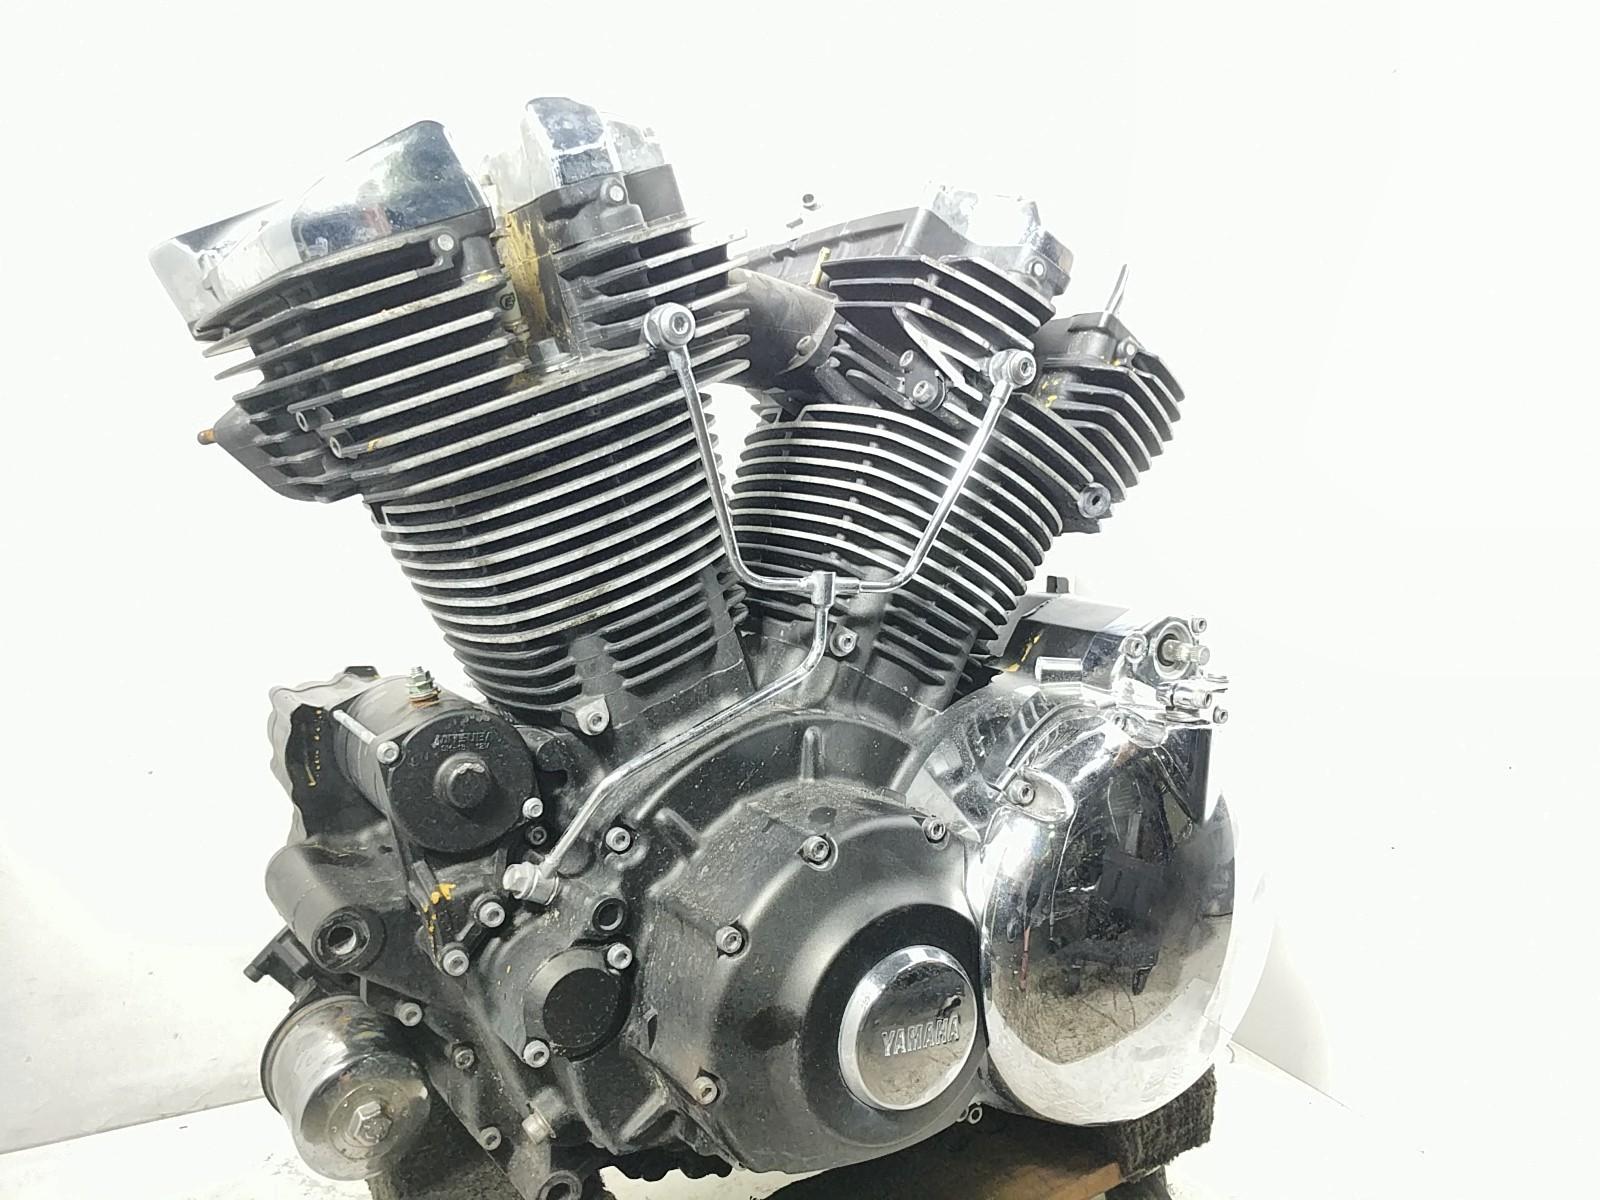 Details About 07 Yamaha Roadstar Xv 1700 Engine Motor Guaranteed